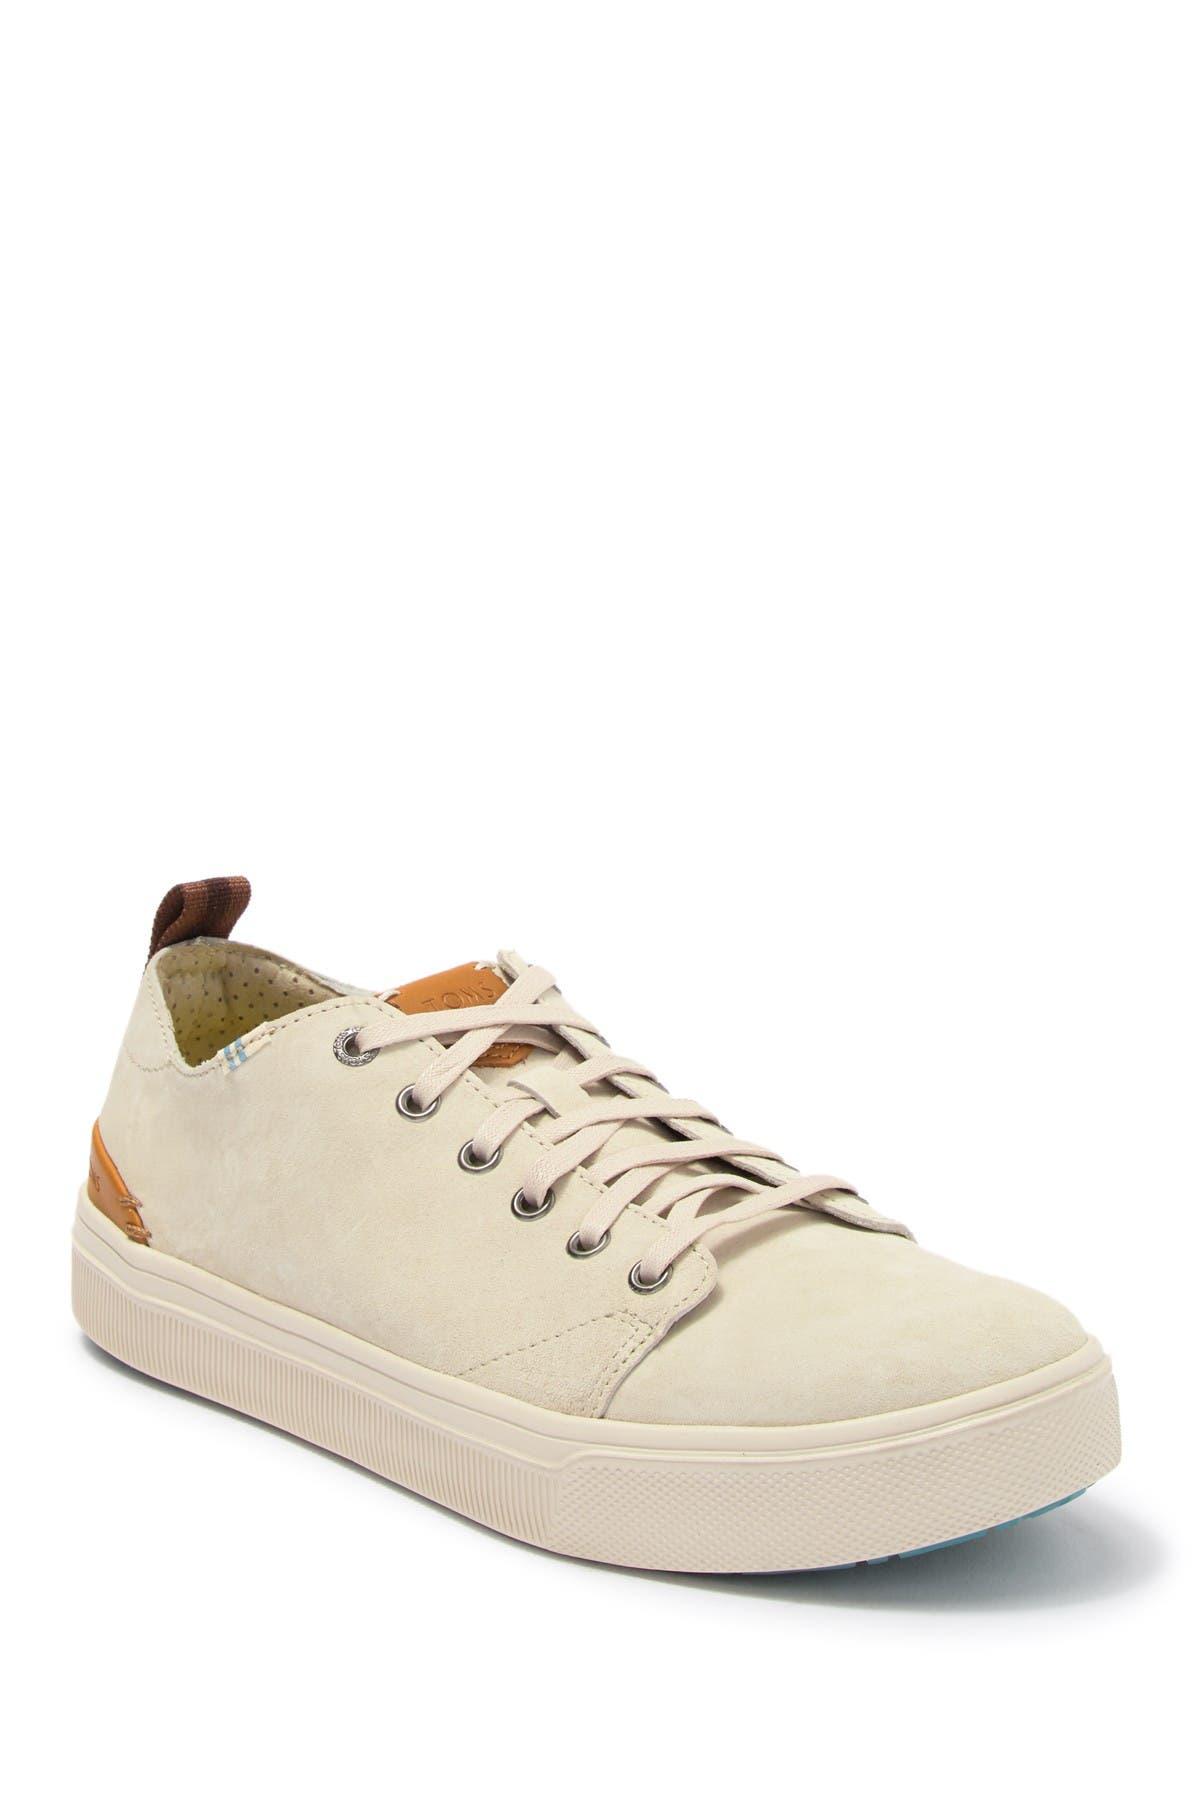 TOMS | Travel Lite Low-Top Sneaker